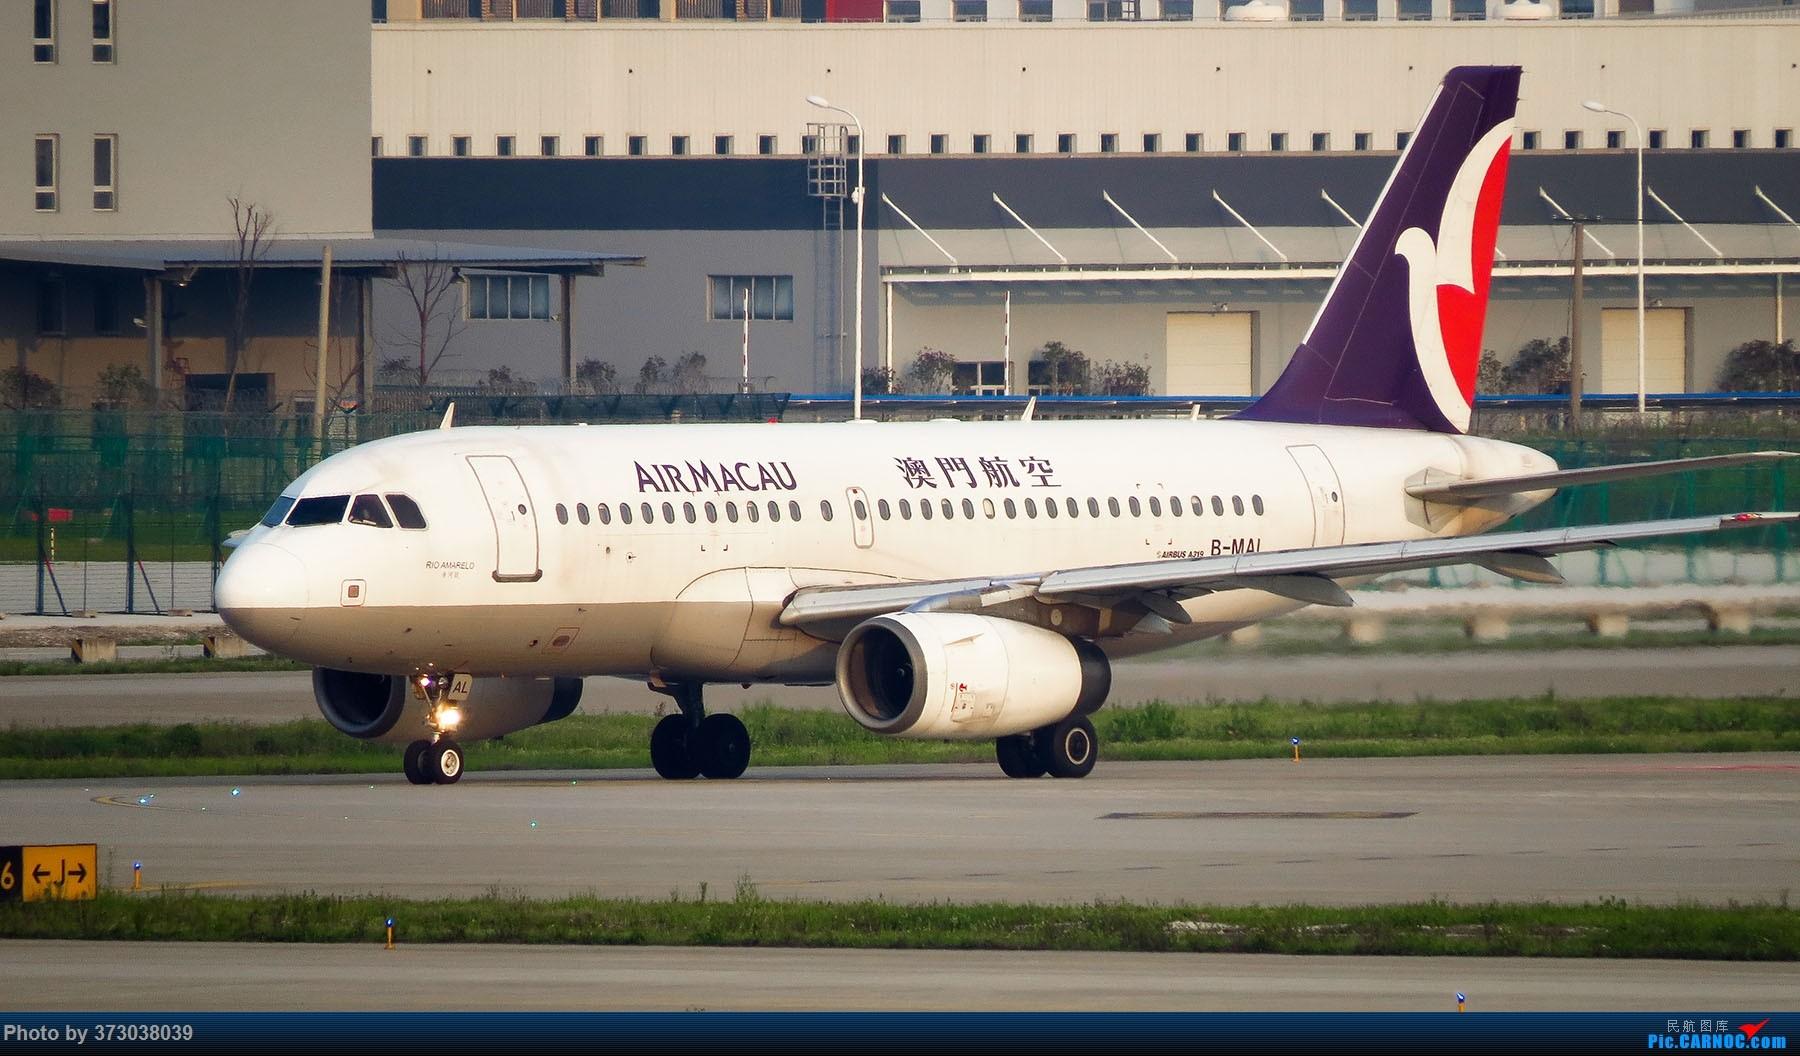 Re:[原创]高原小王子 空客A319 的小节日,HGH杭州萧山机场站 AIRBUS A319-100 B-MAL 中国杭州萧山国际机场